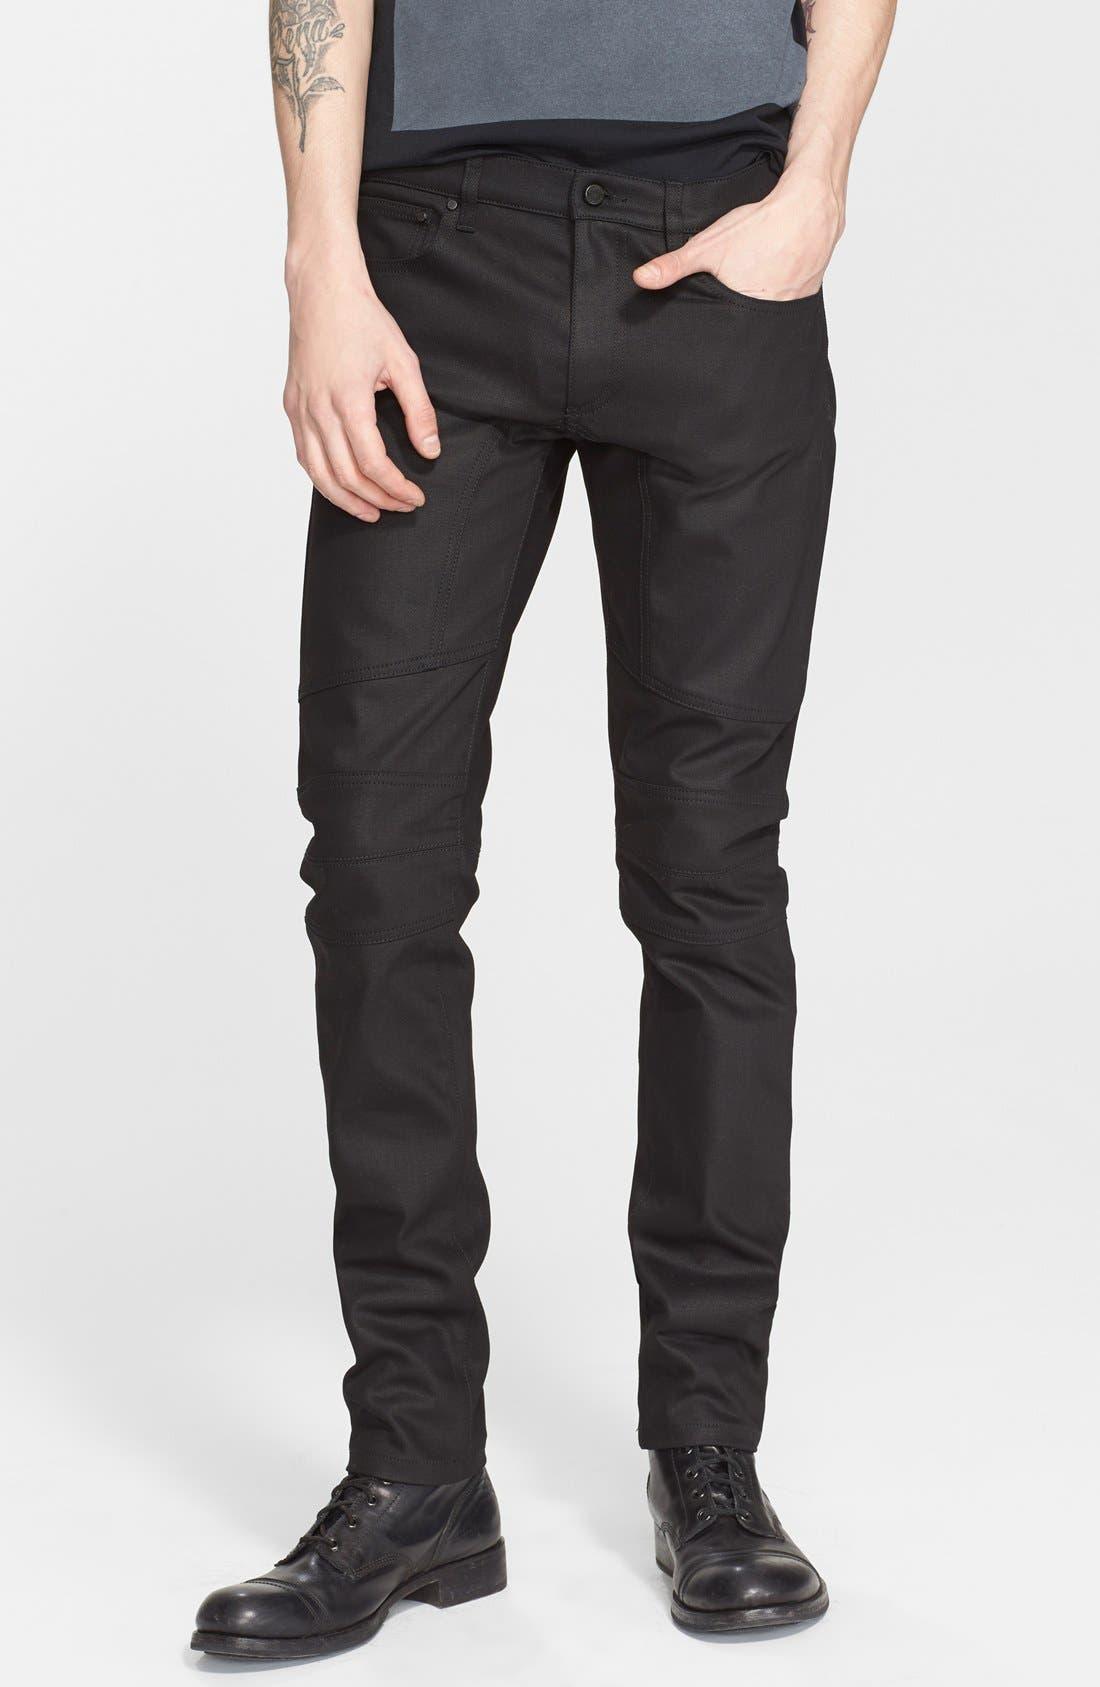 BELSTAFF 'Elmbridge' Slim Fit Moto Jeans